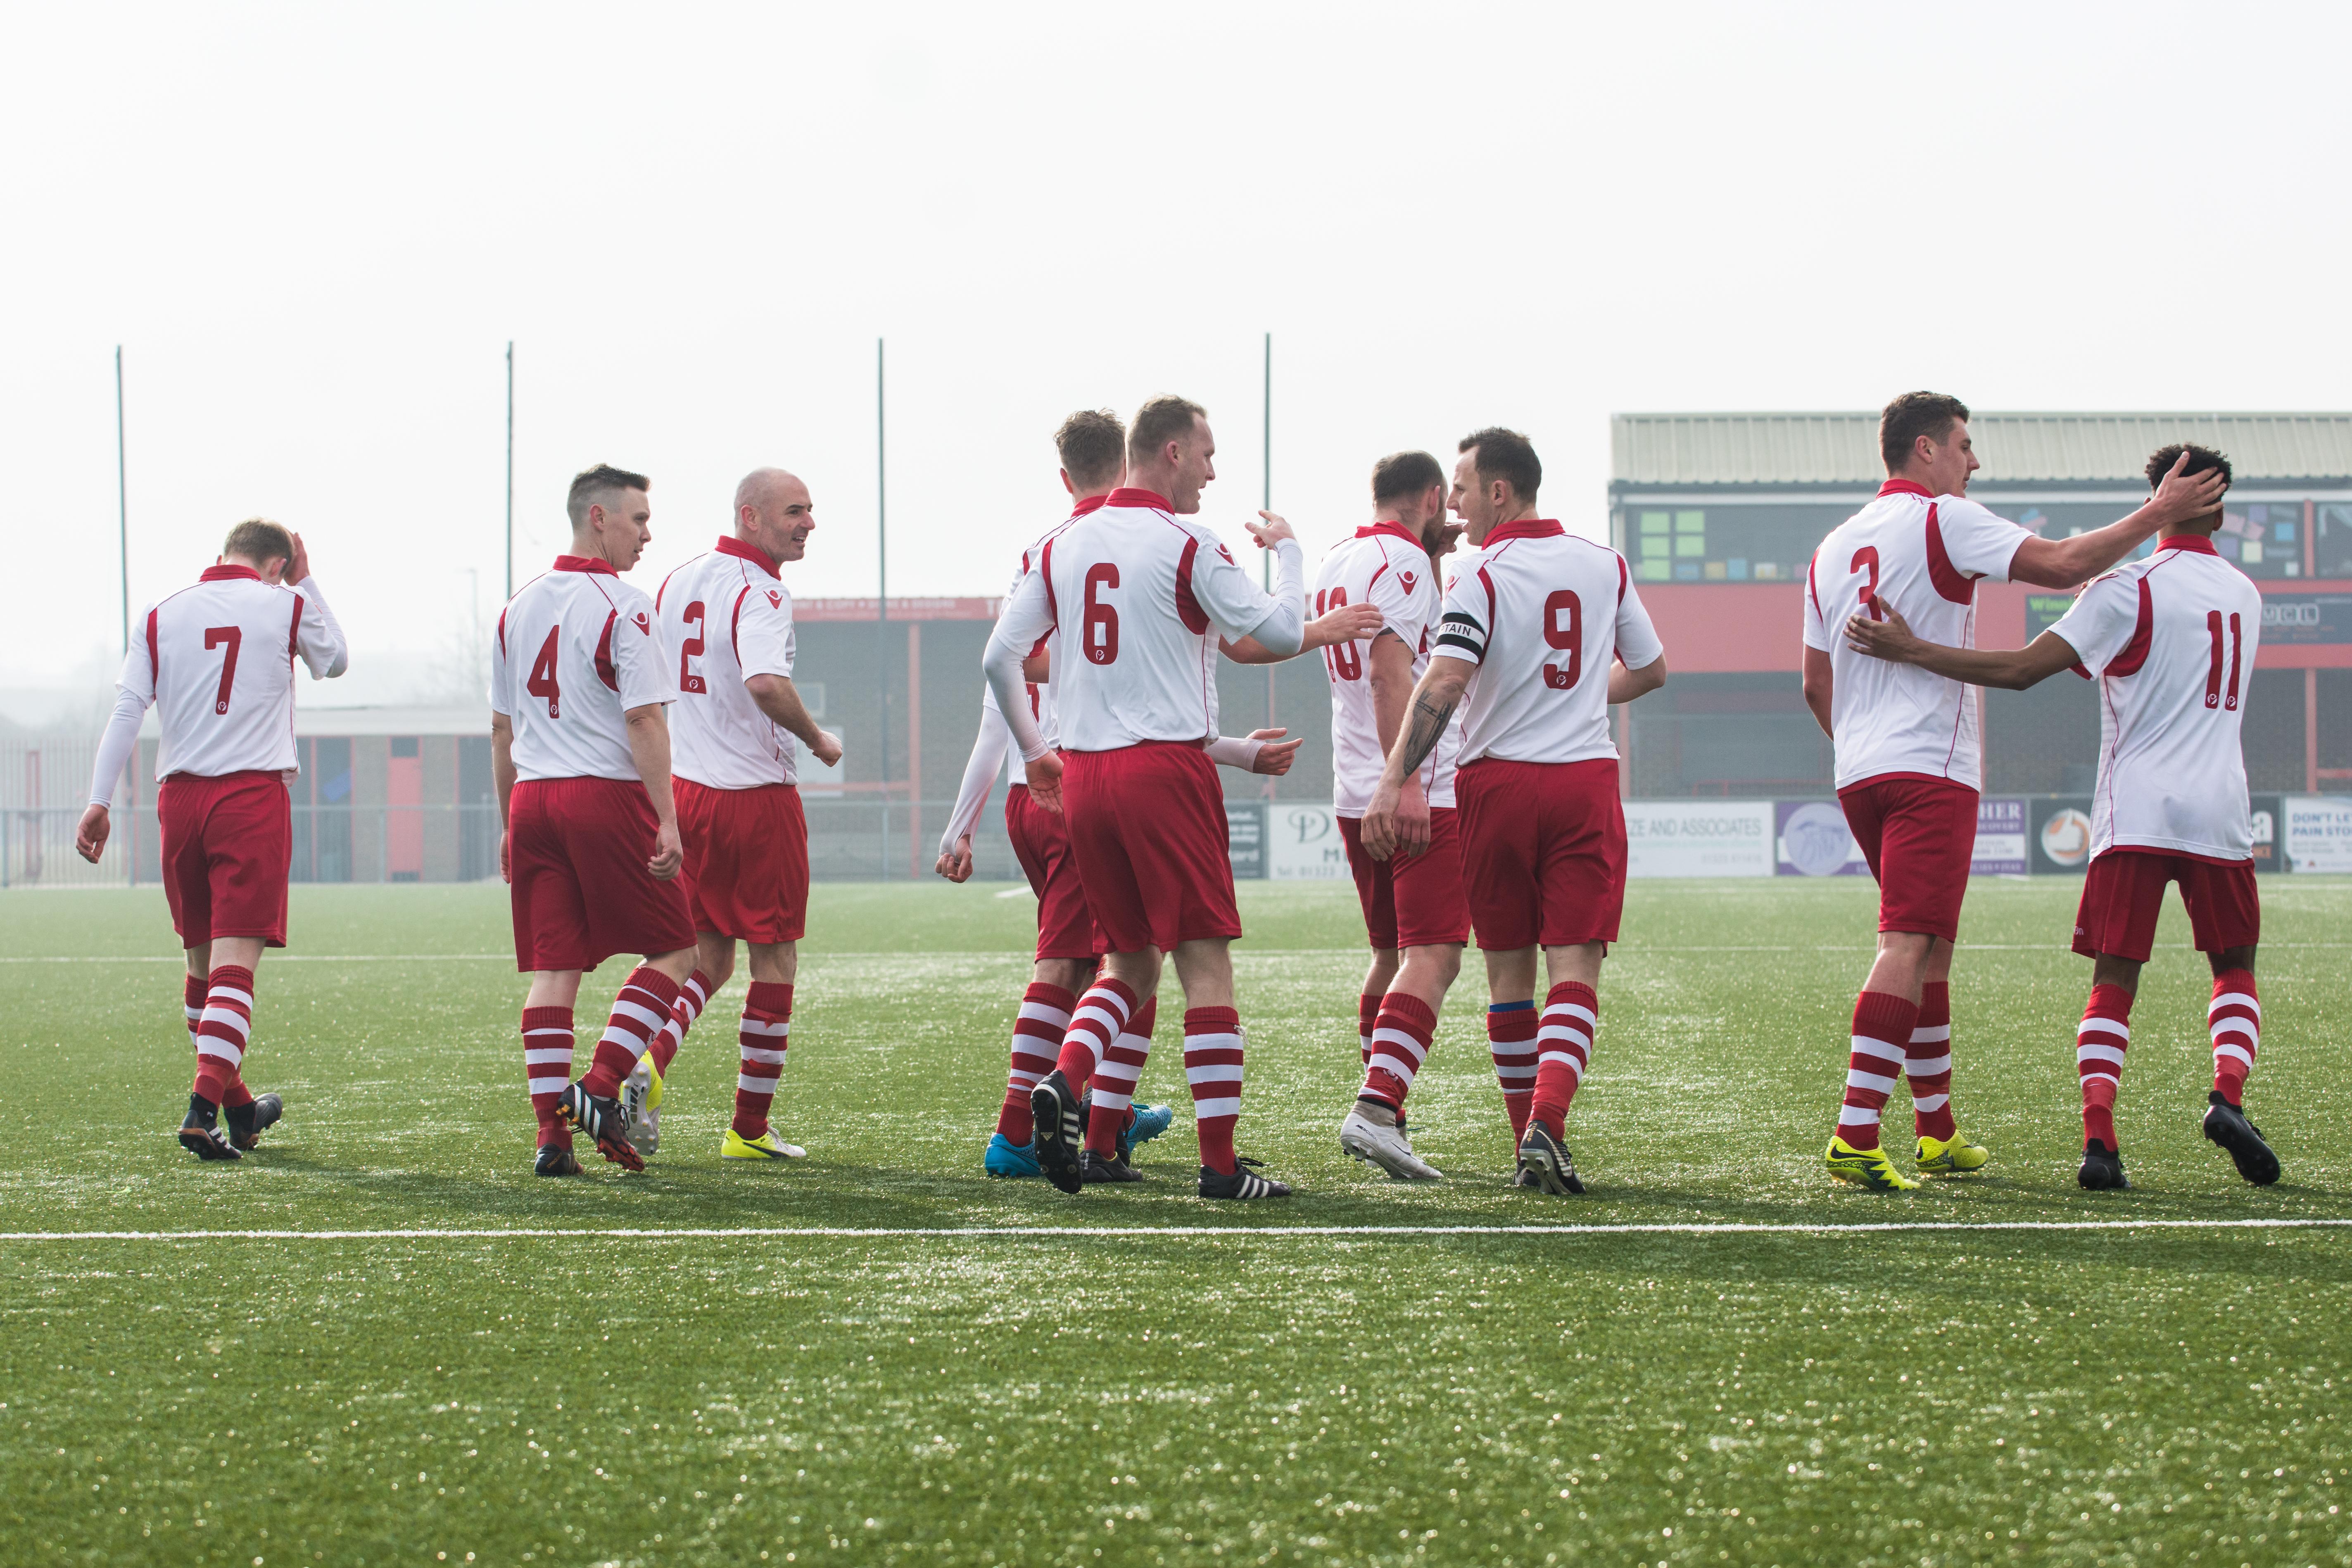 DAVID_JEFFERY Langney Wanderers FC vs Bexhill United FC 03.03.18 42